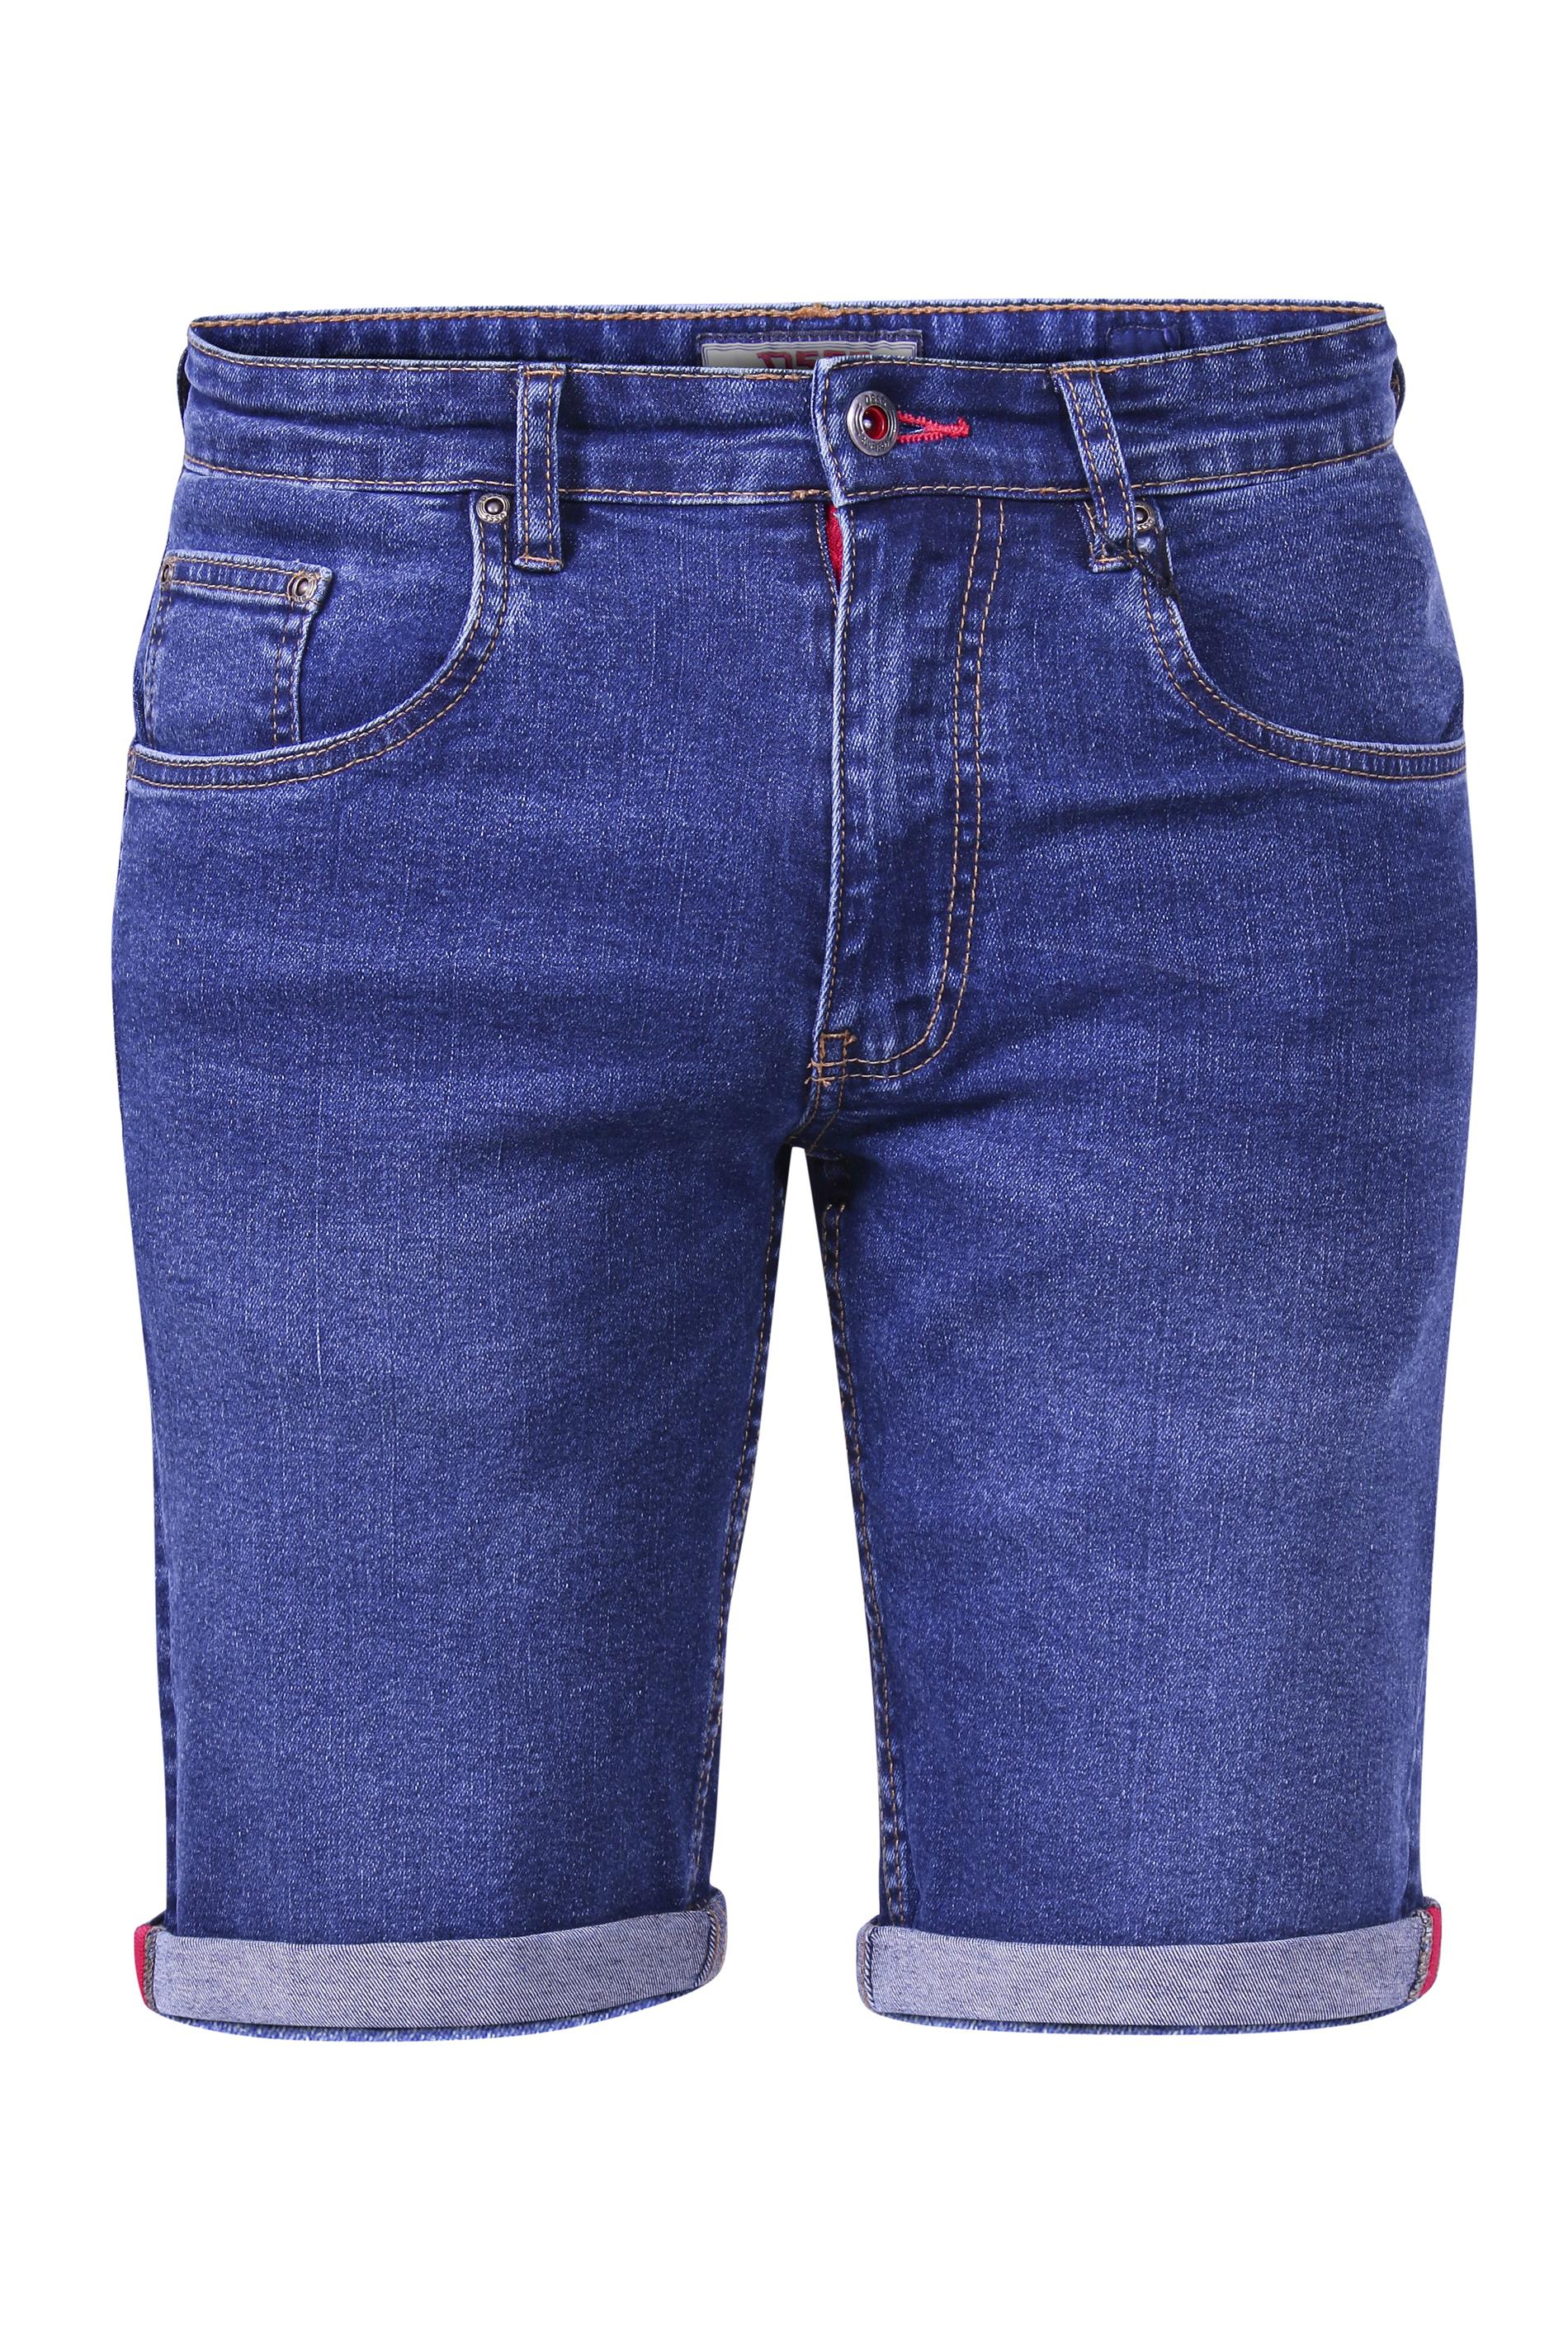 D555 Mid-Blue Stretch Denim Shorts